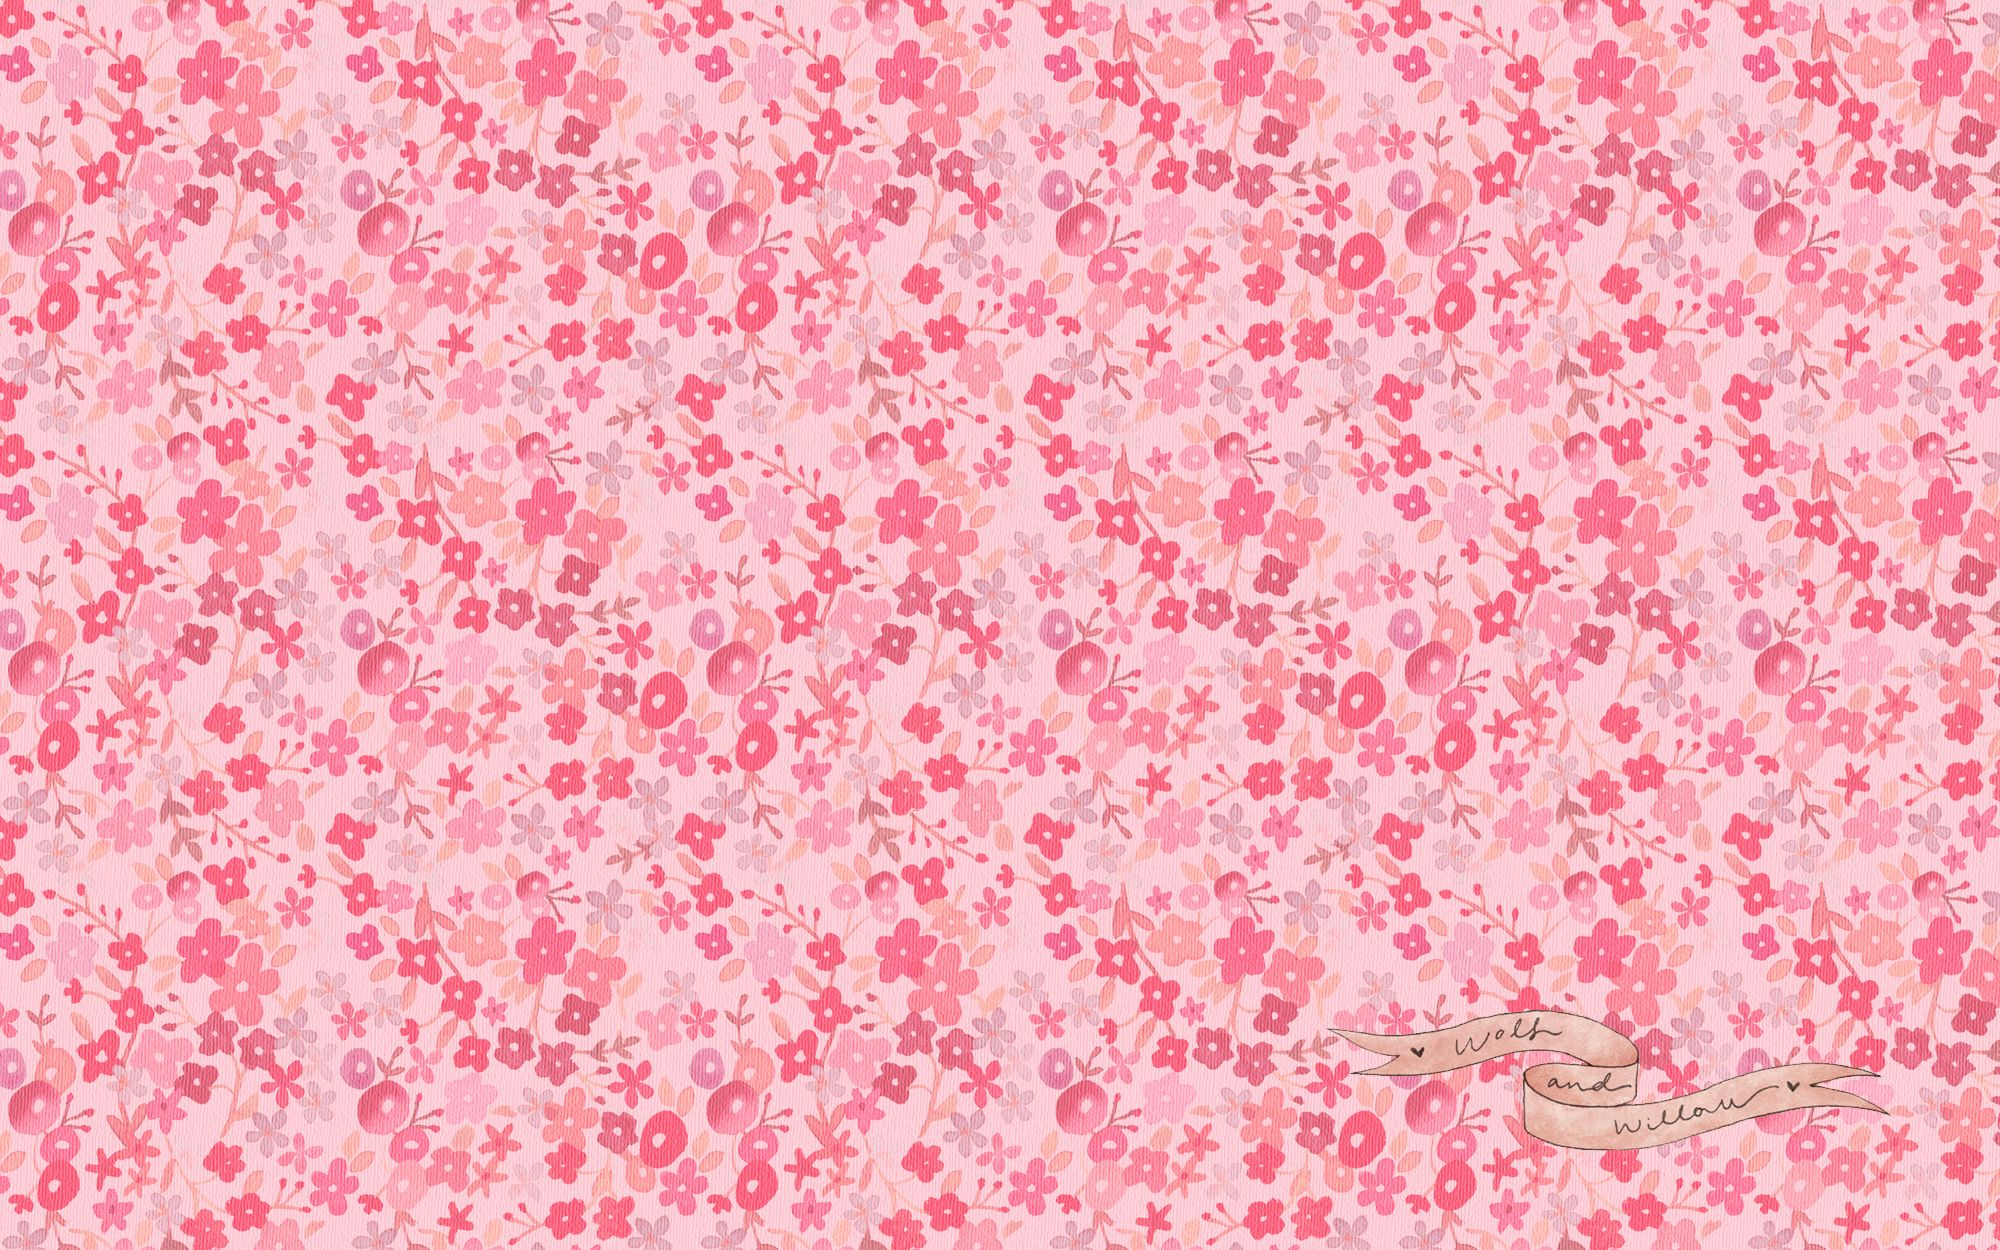 Pink Small Flower Wallpaper Wallpaper Free Download Flowers